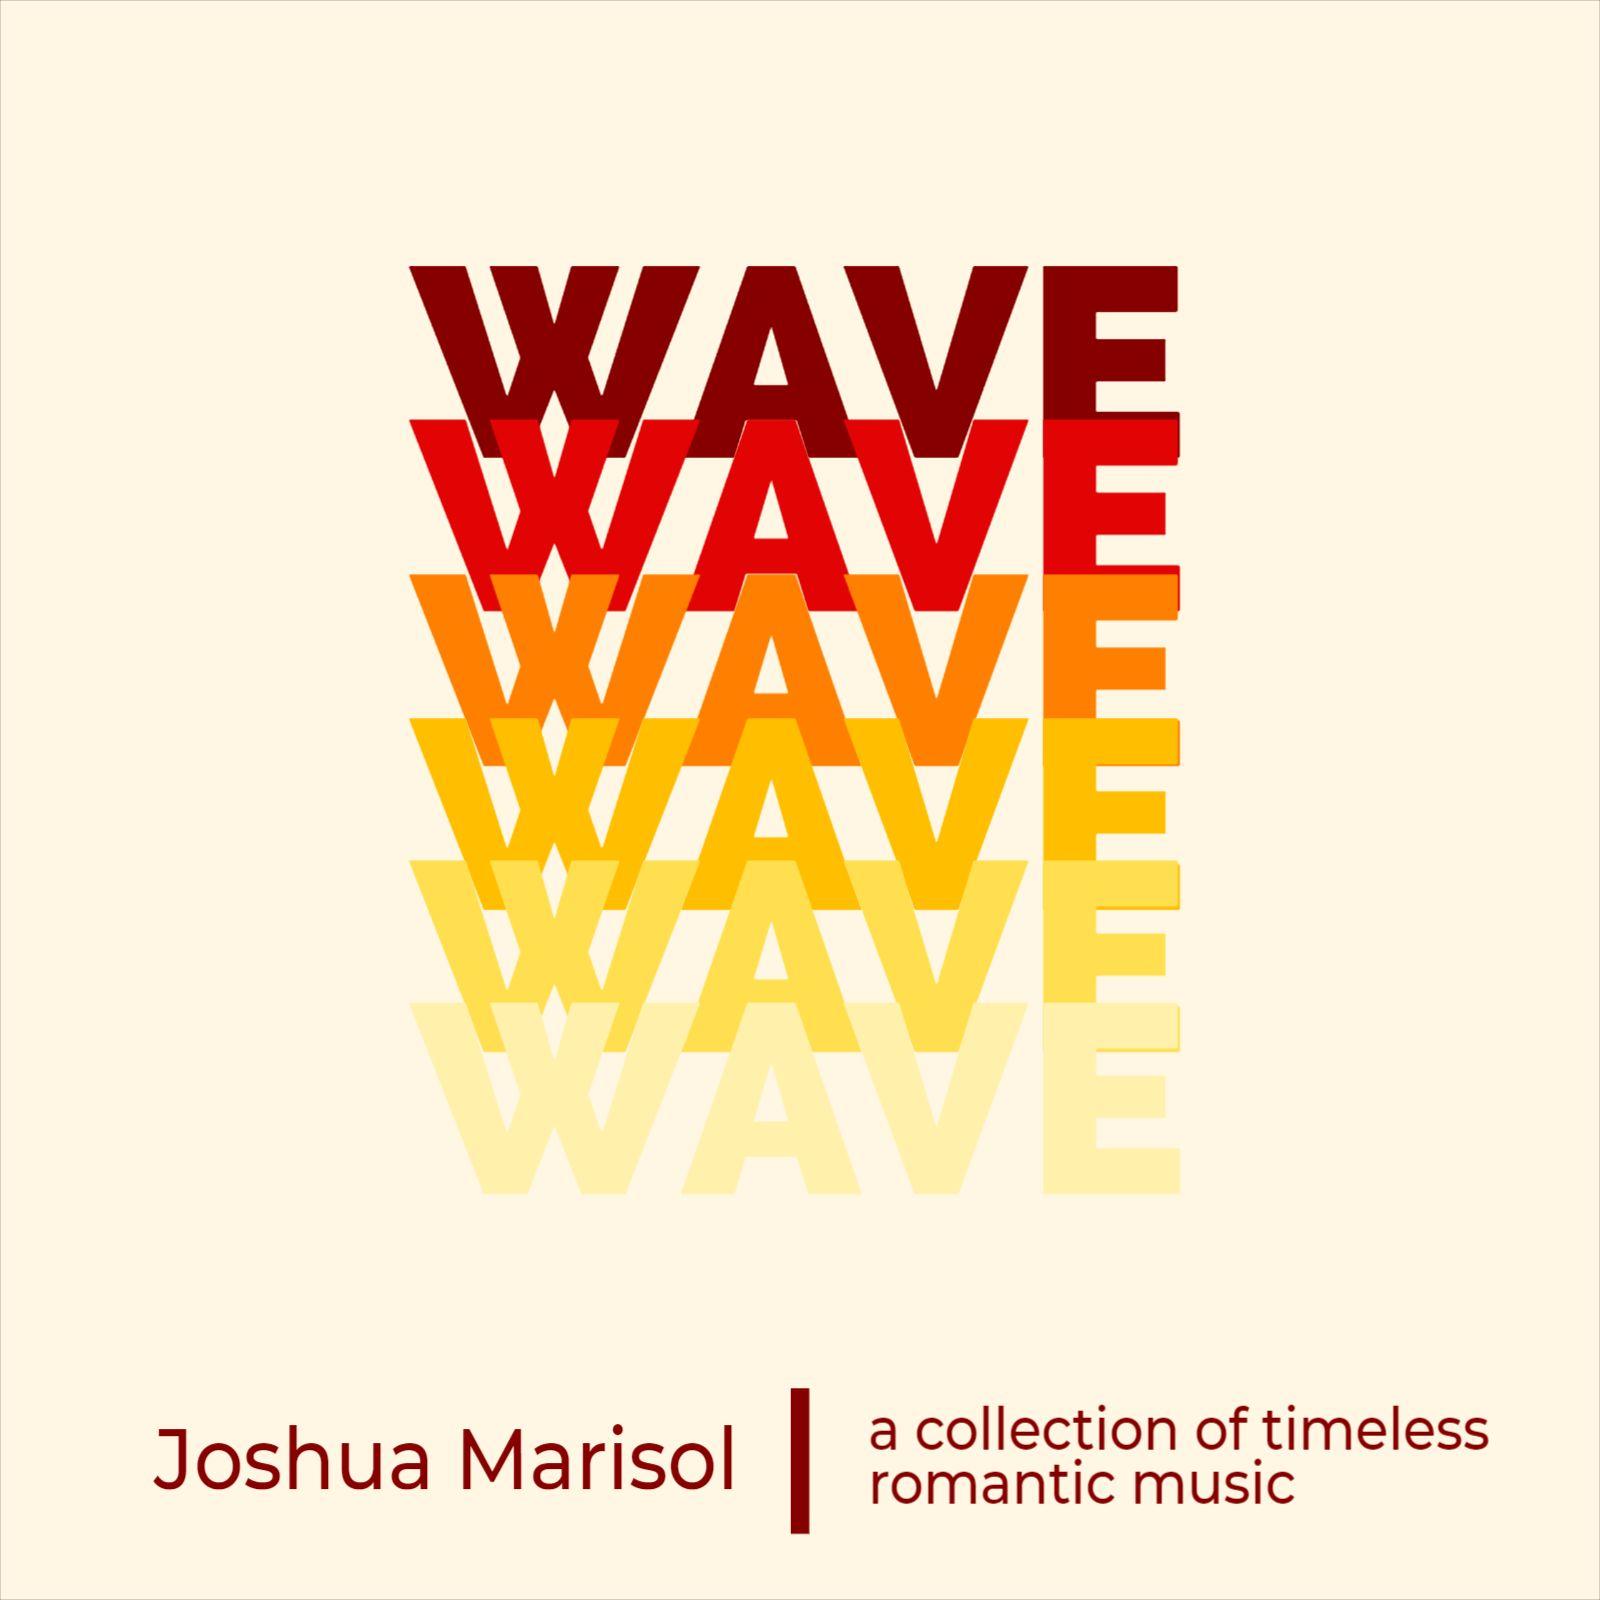 Wave Design Album Cover Template